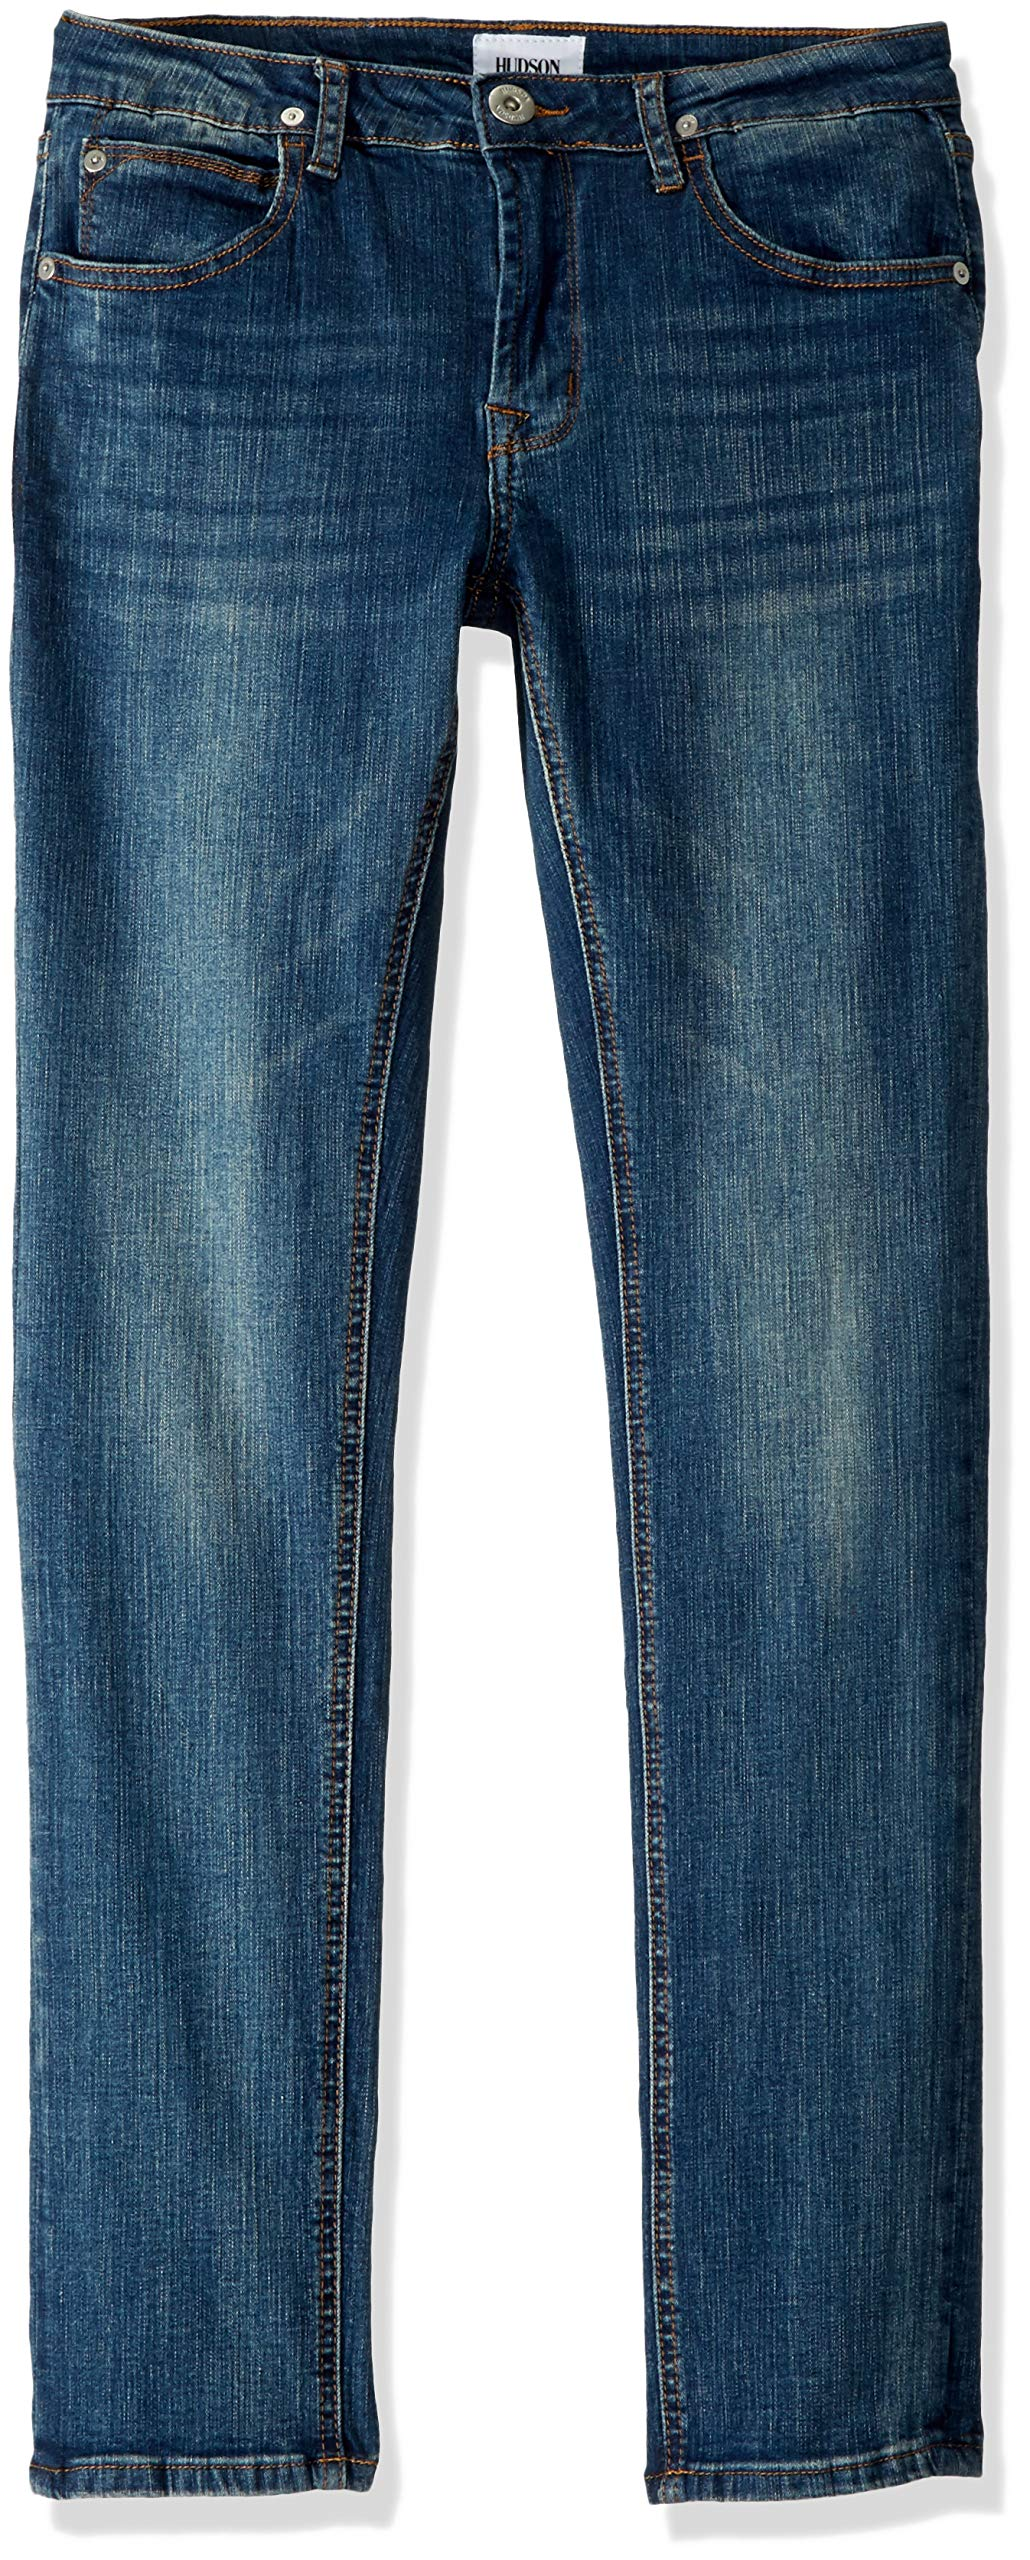 HUDSON Boys' Big Jude Skinny Jean, Legend wash, 16